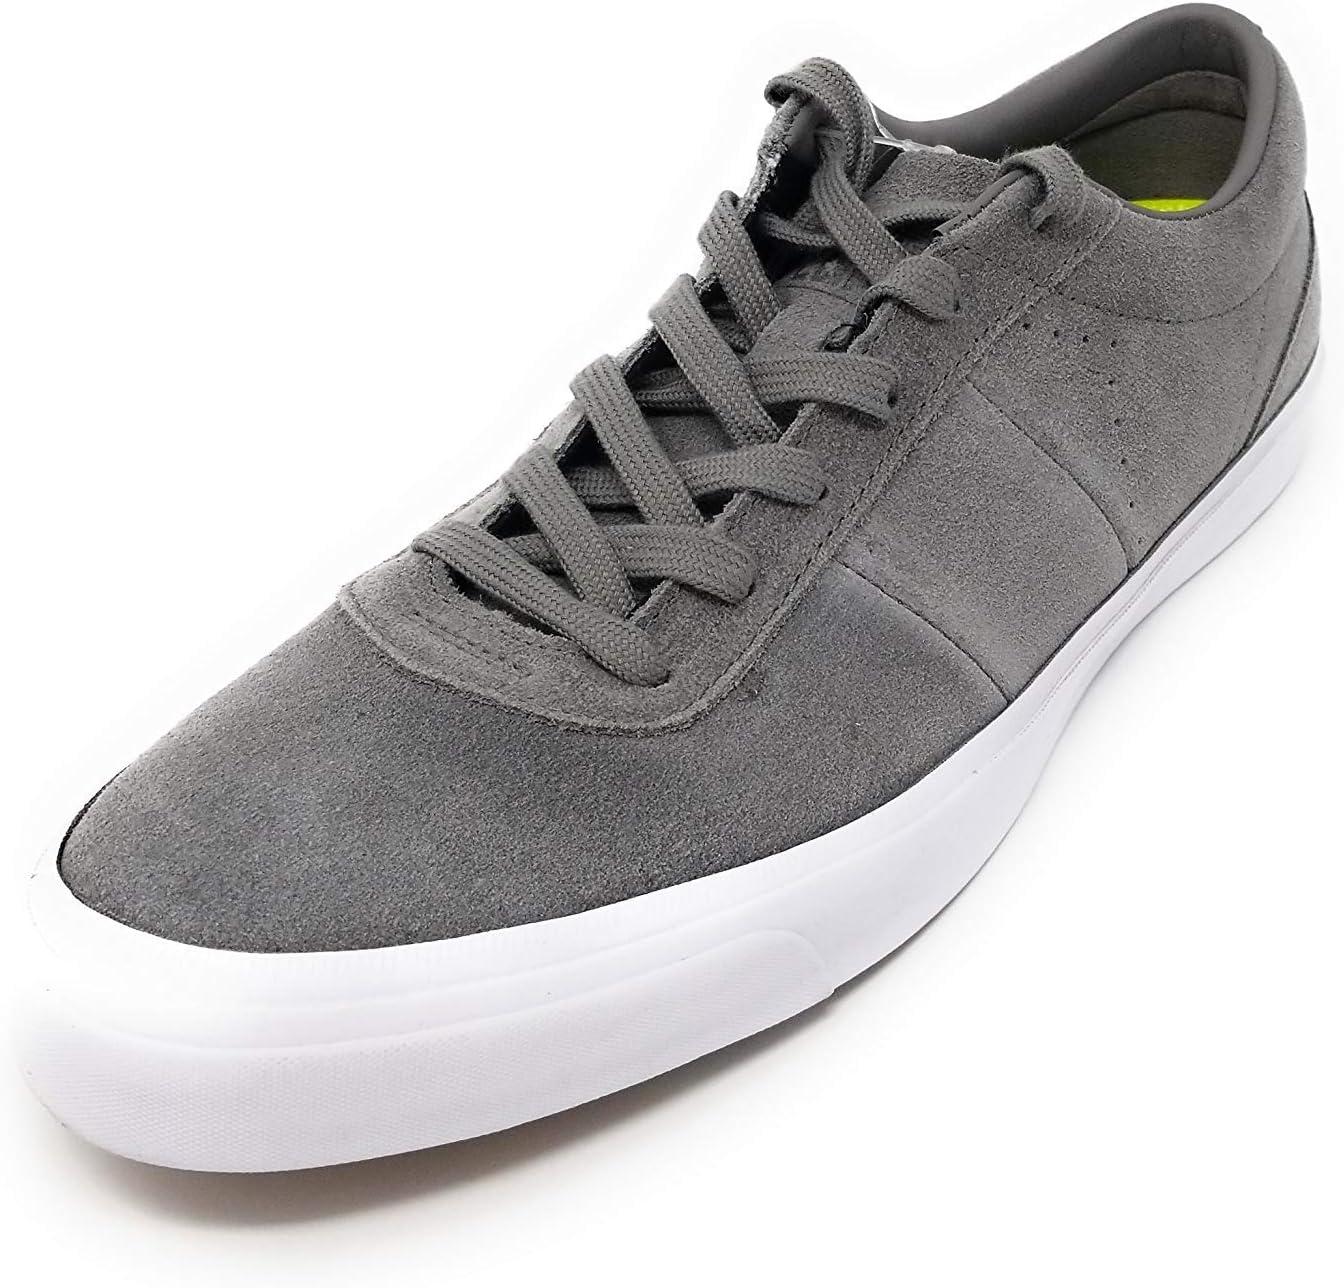 Converse USA Inc. One Star CC OX Charcoal Grey